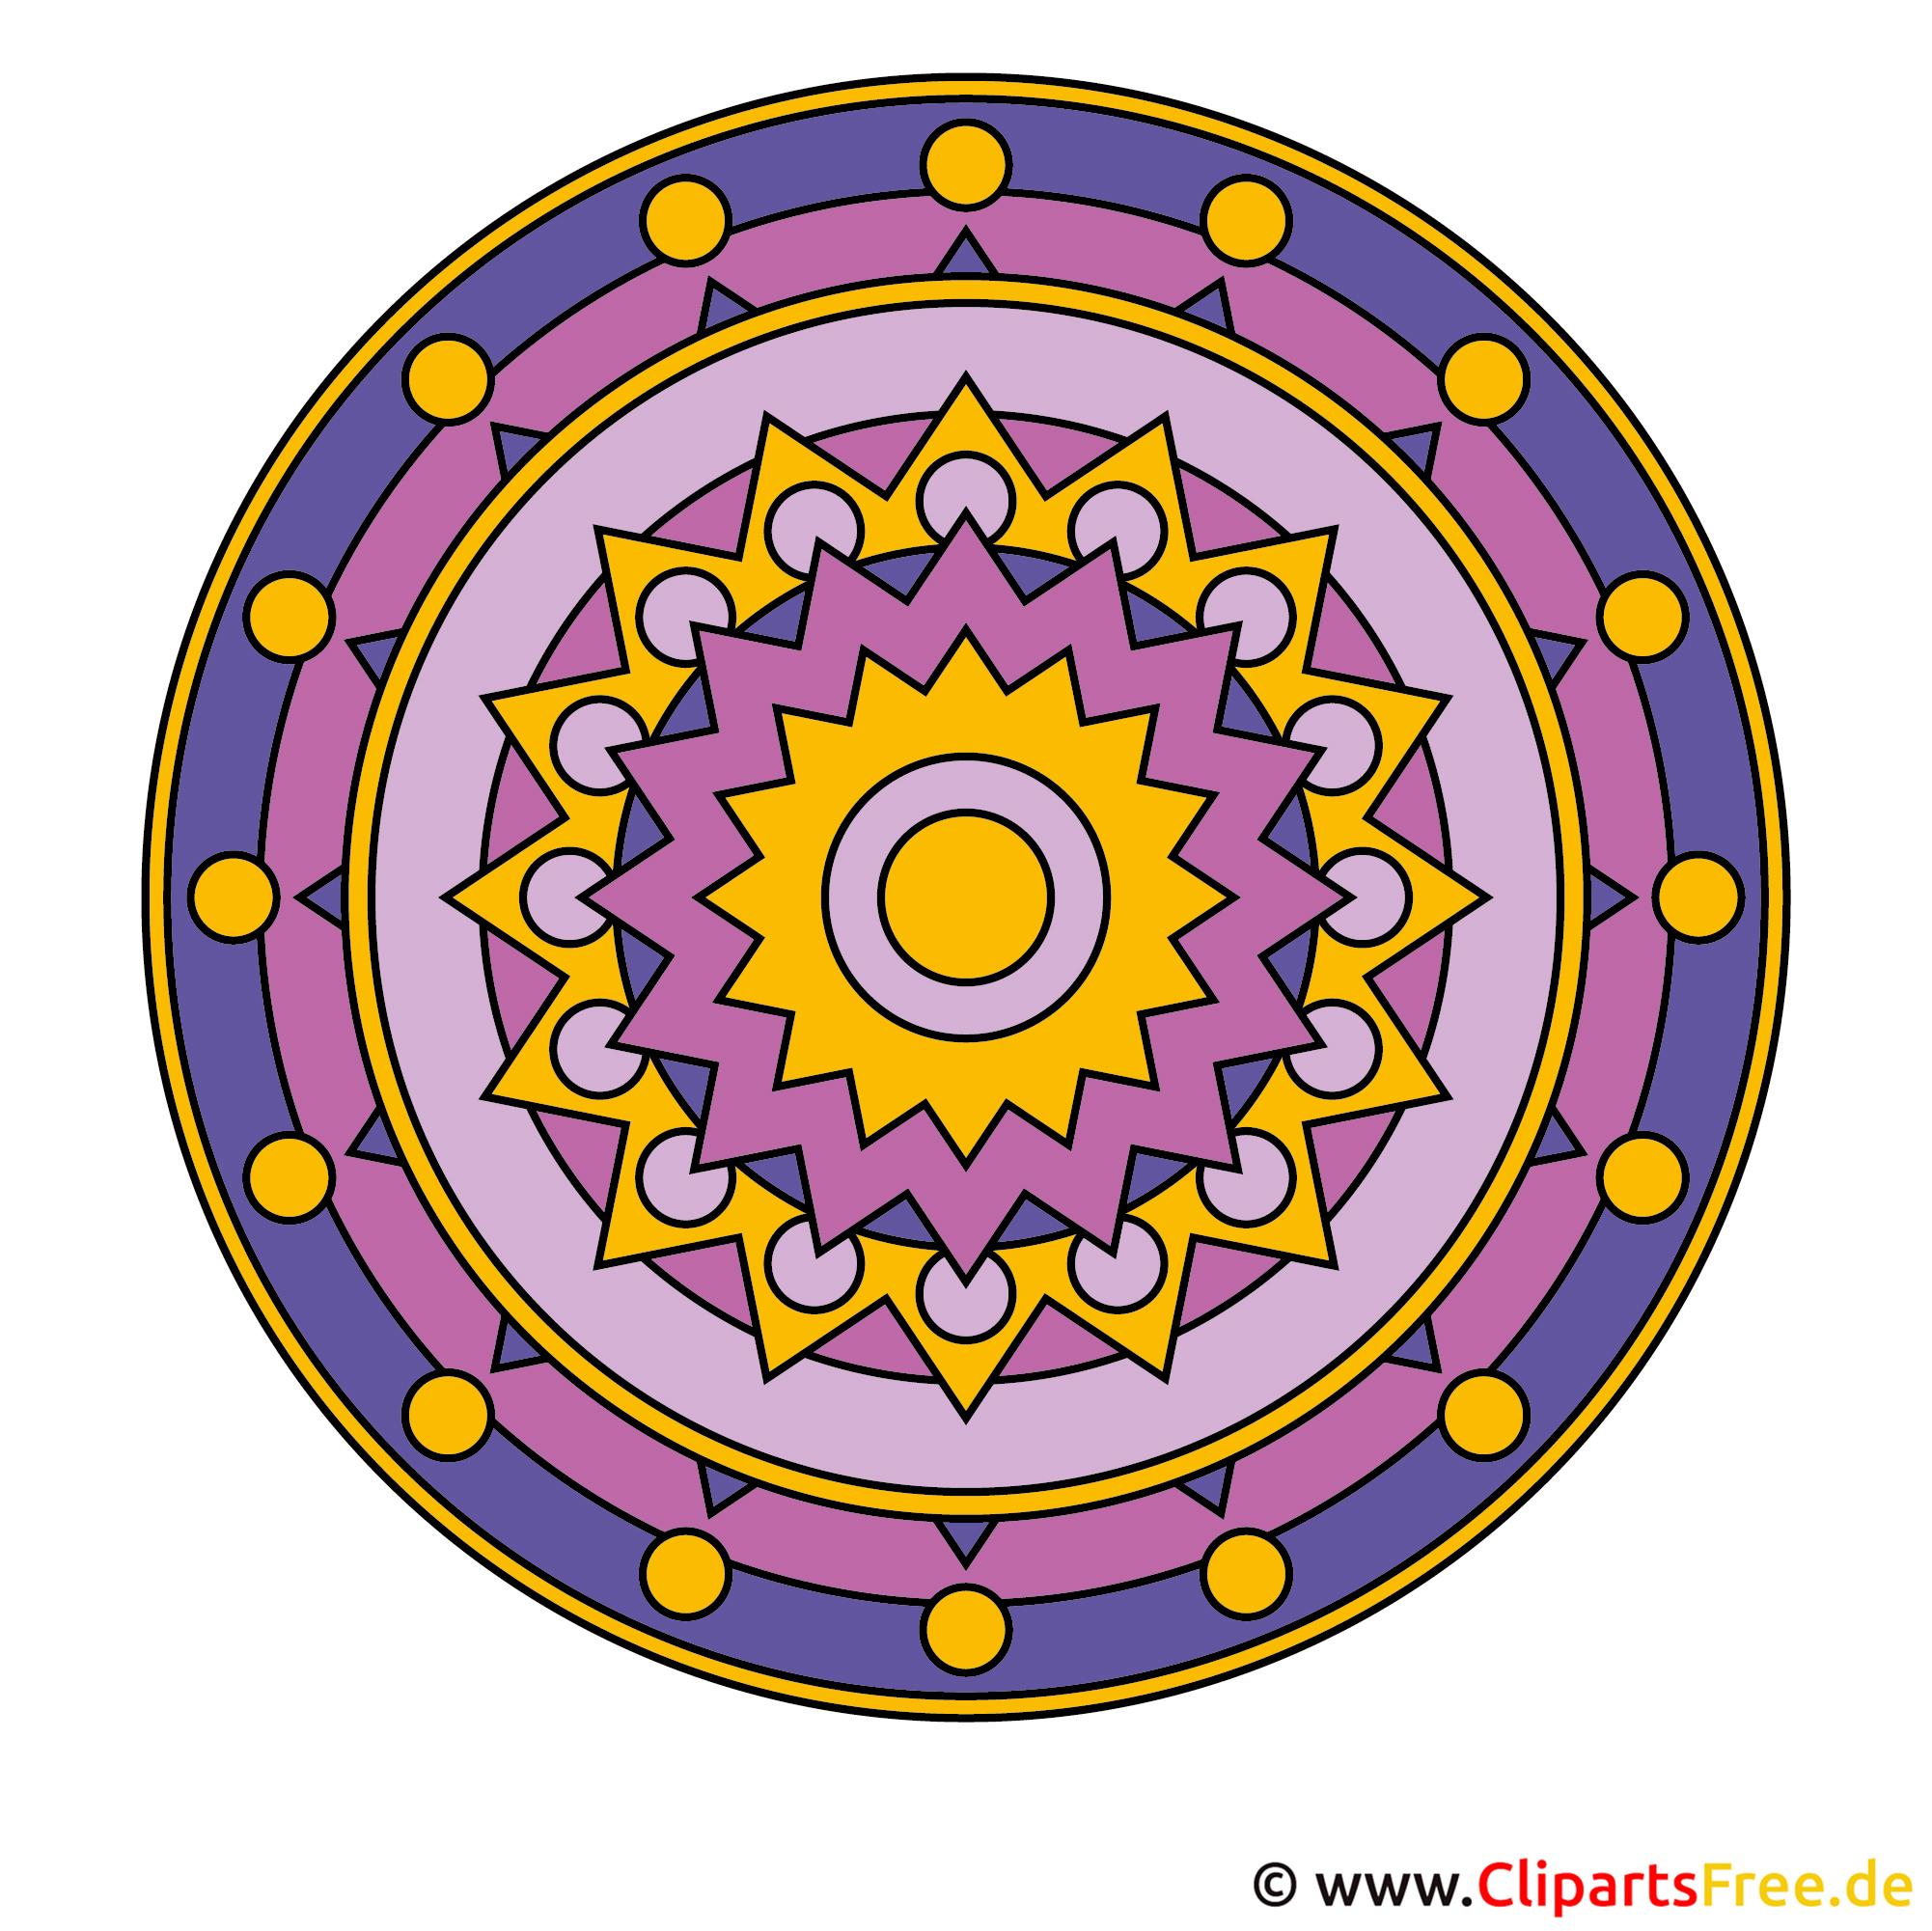 Mandala zum Drucken